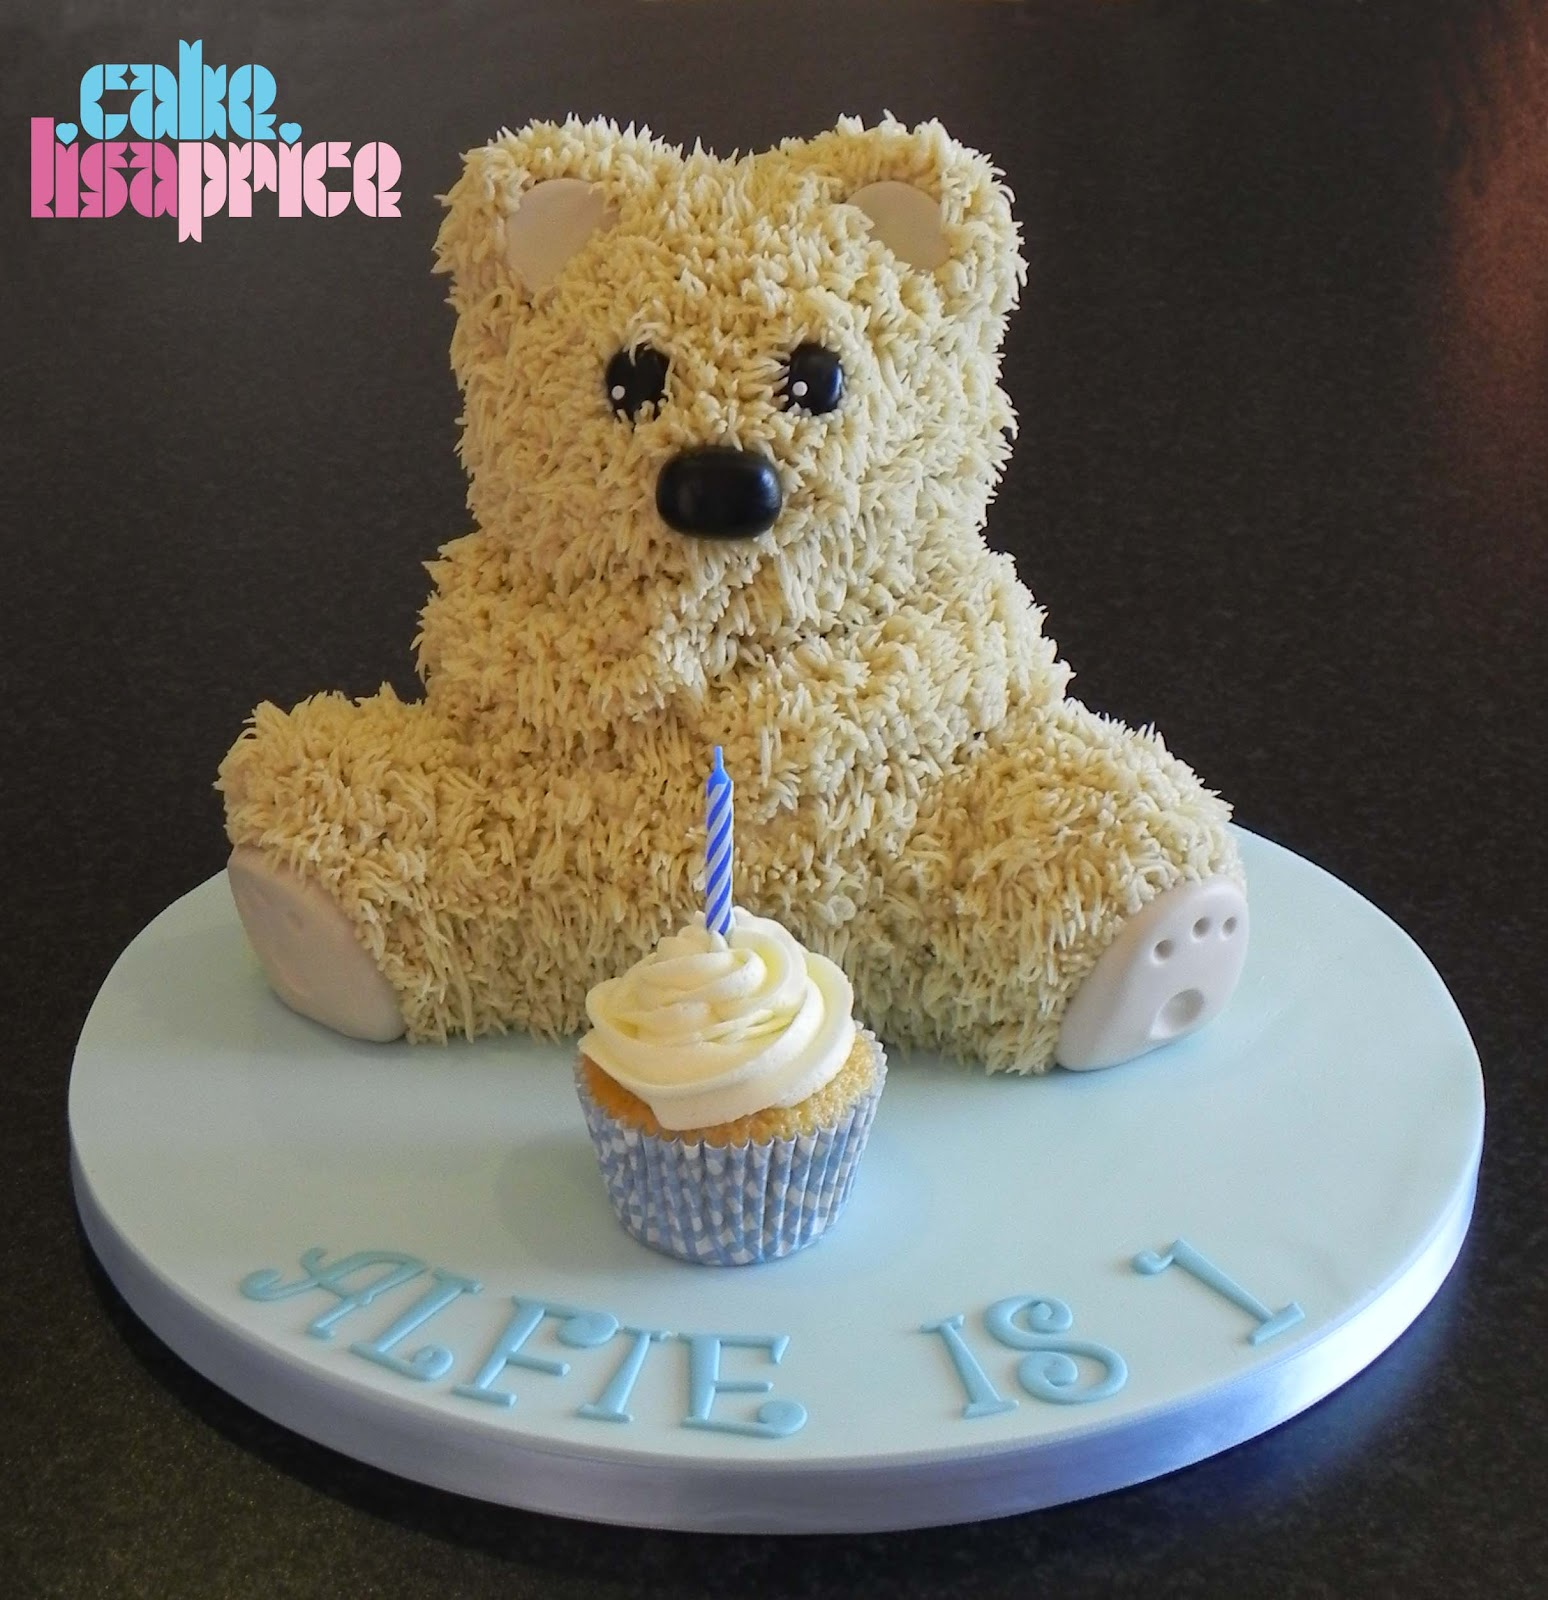 Cake By Lisa Price